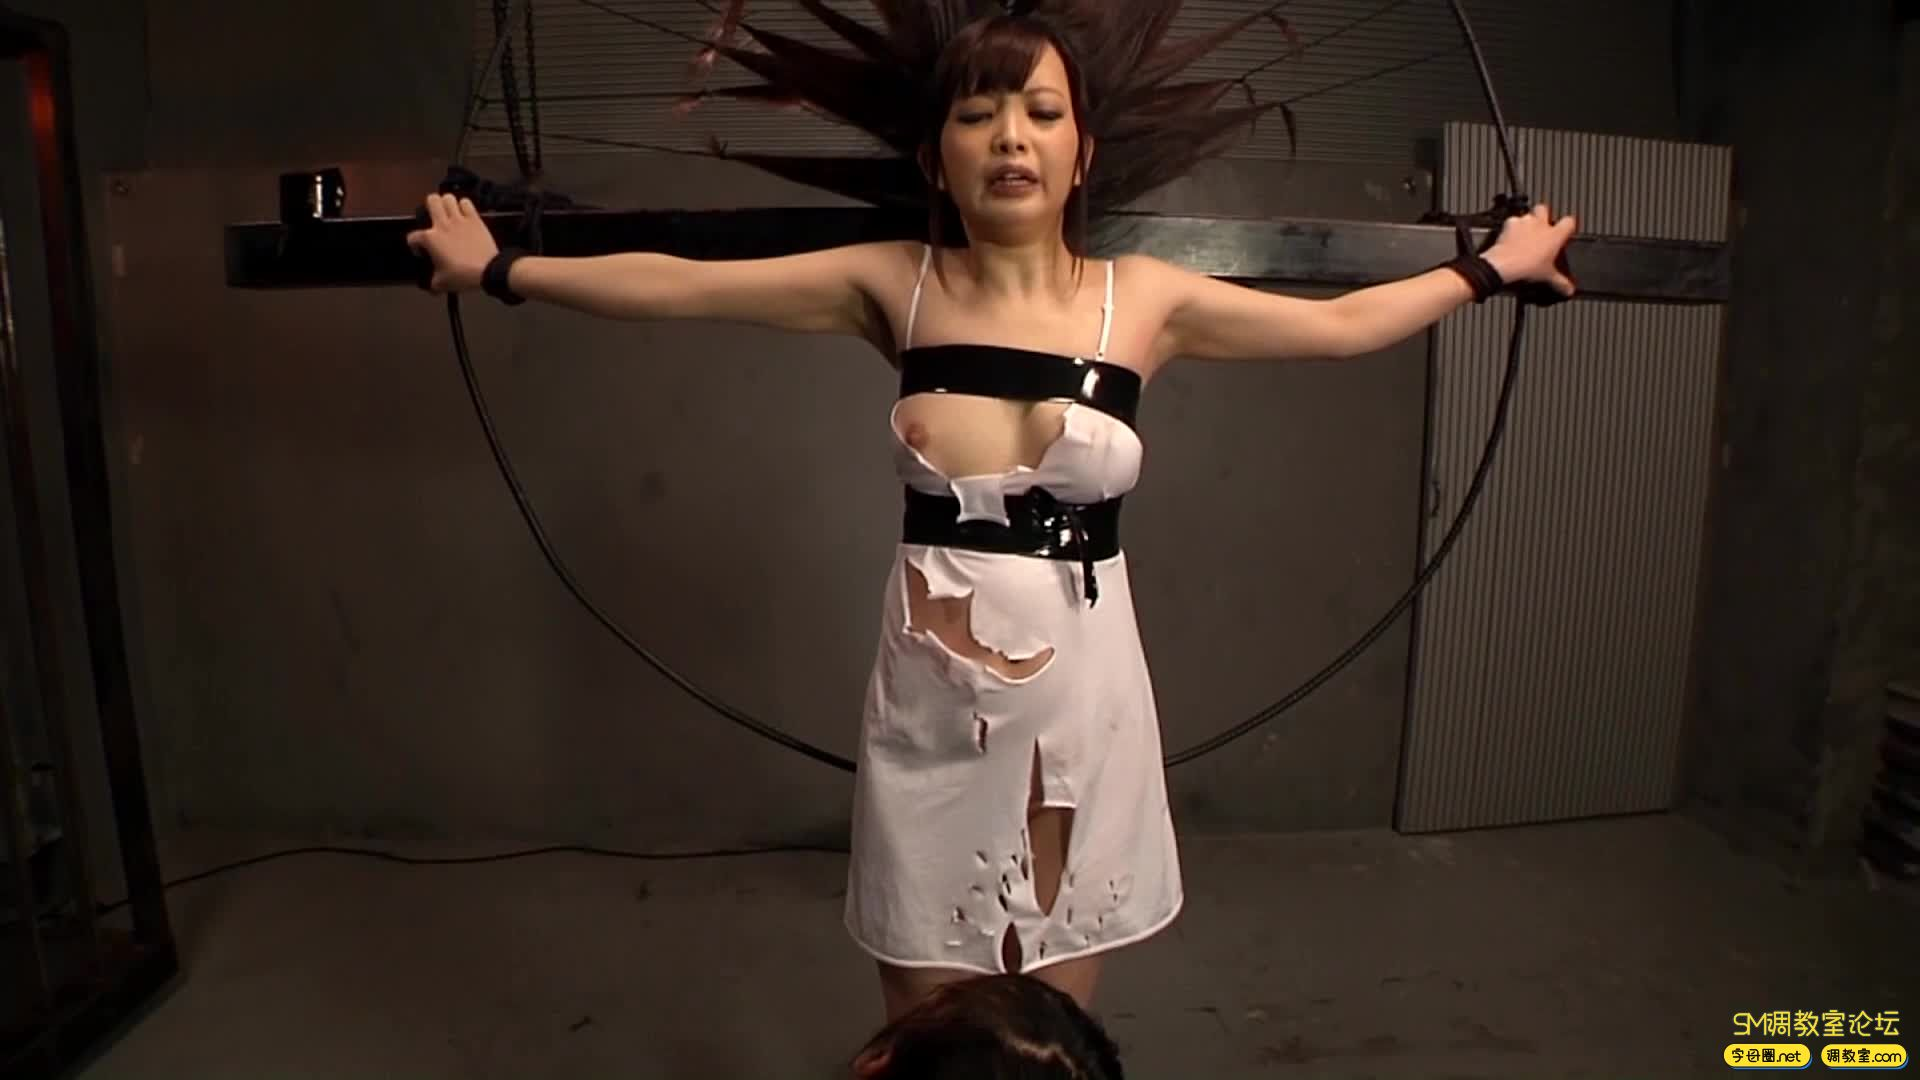 [Dogma合集] - NTJ-001 - 少女拷問ROOM 芹沢つむぎ-视频截图2